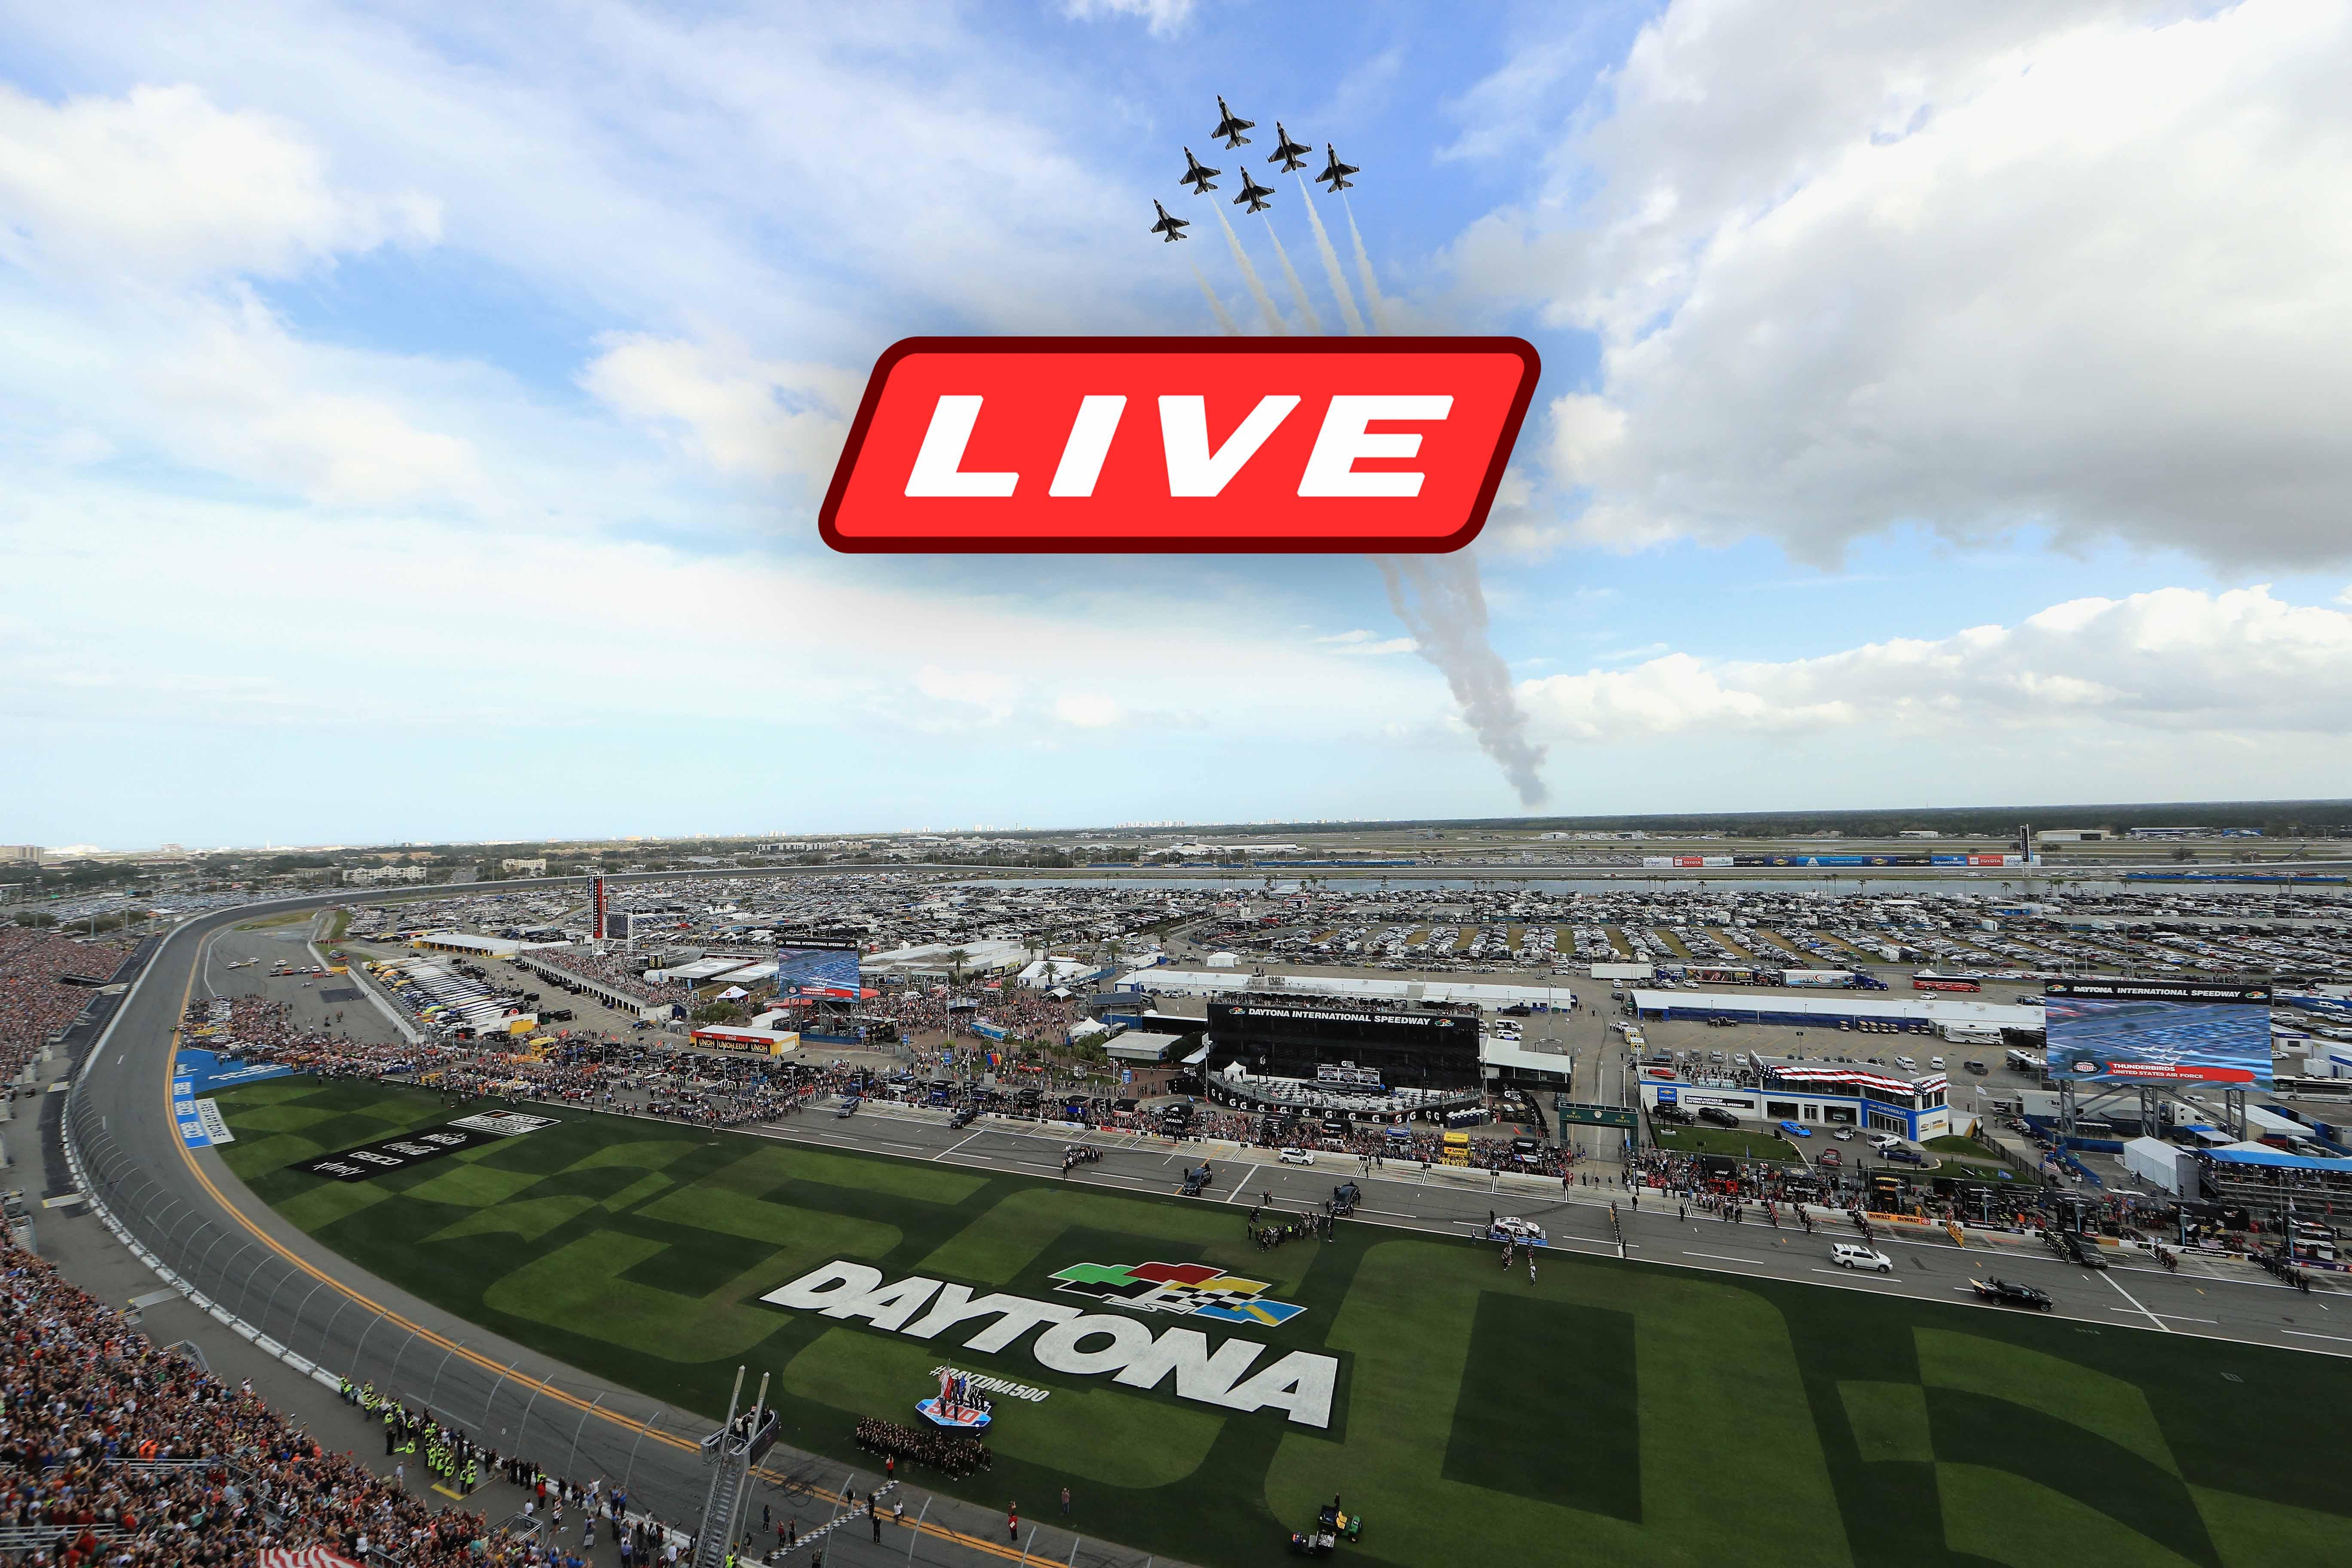 Daytona 500 Results: February 17, 2020 (NASCAR Cup Series)